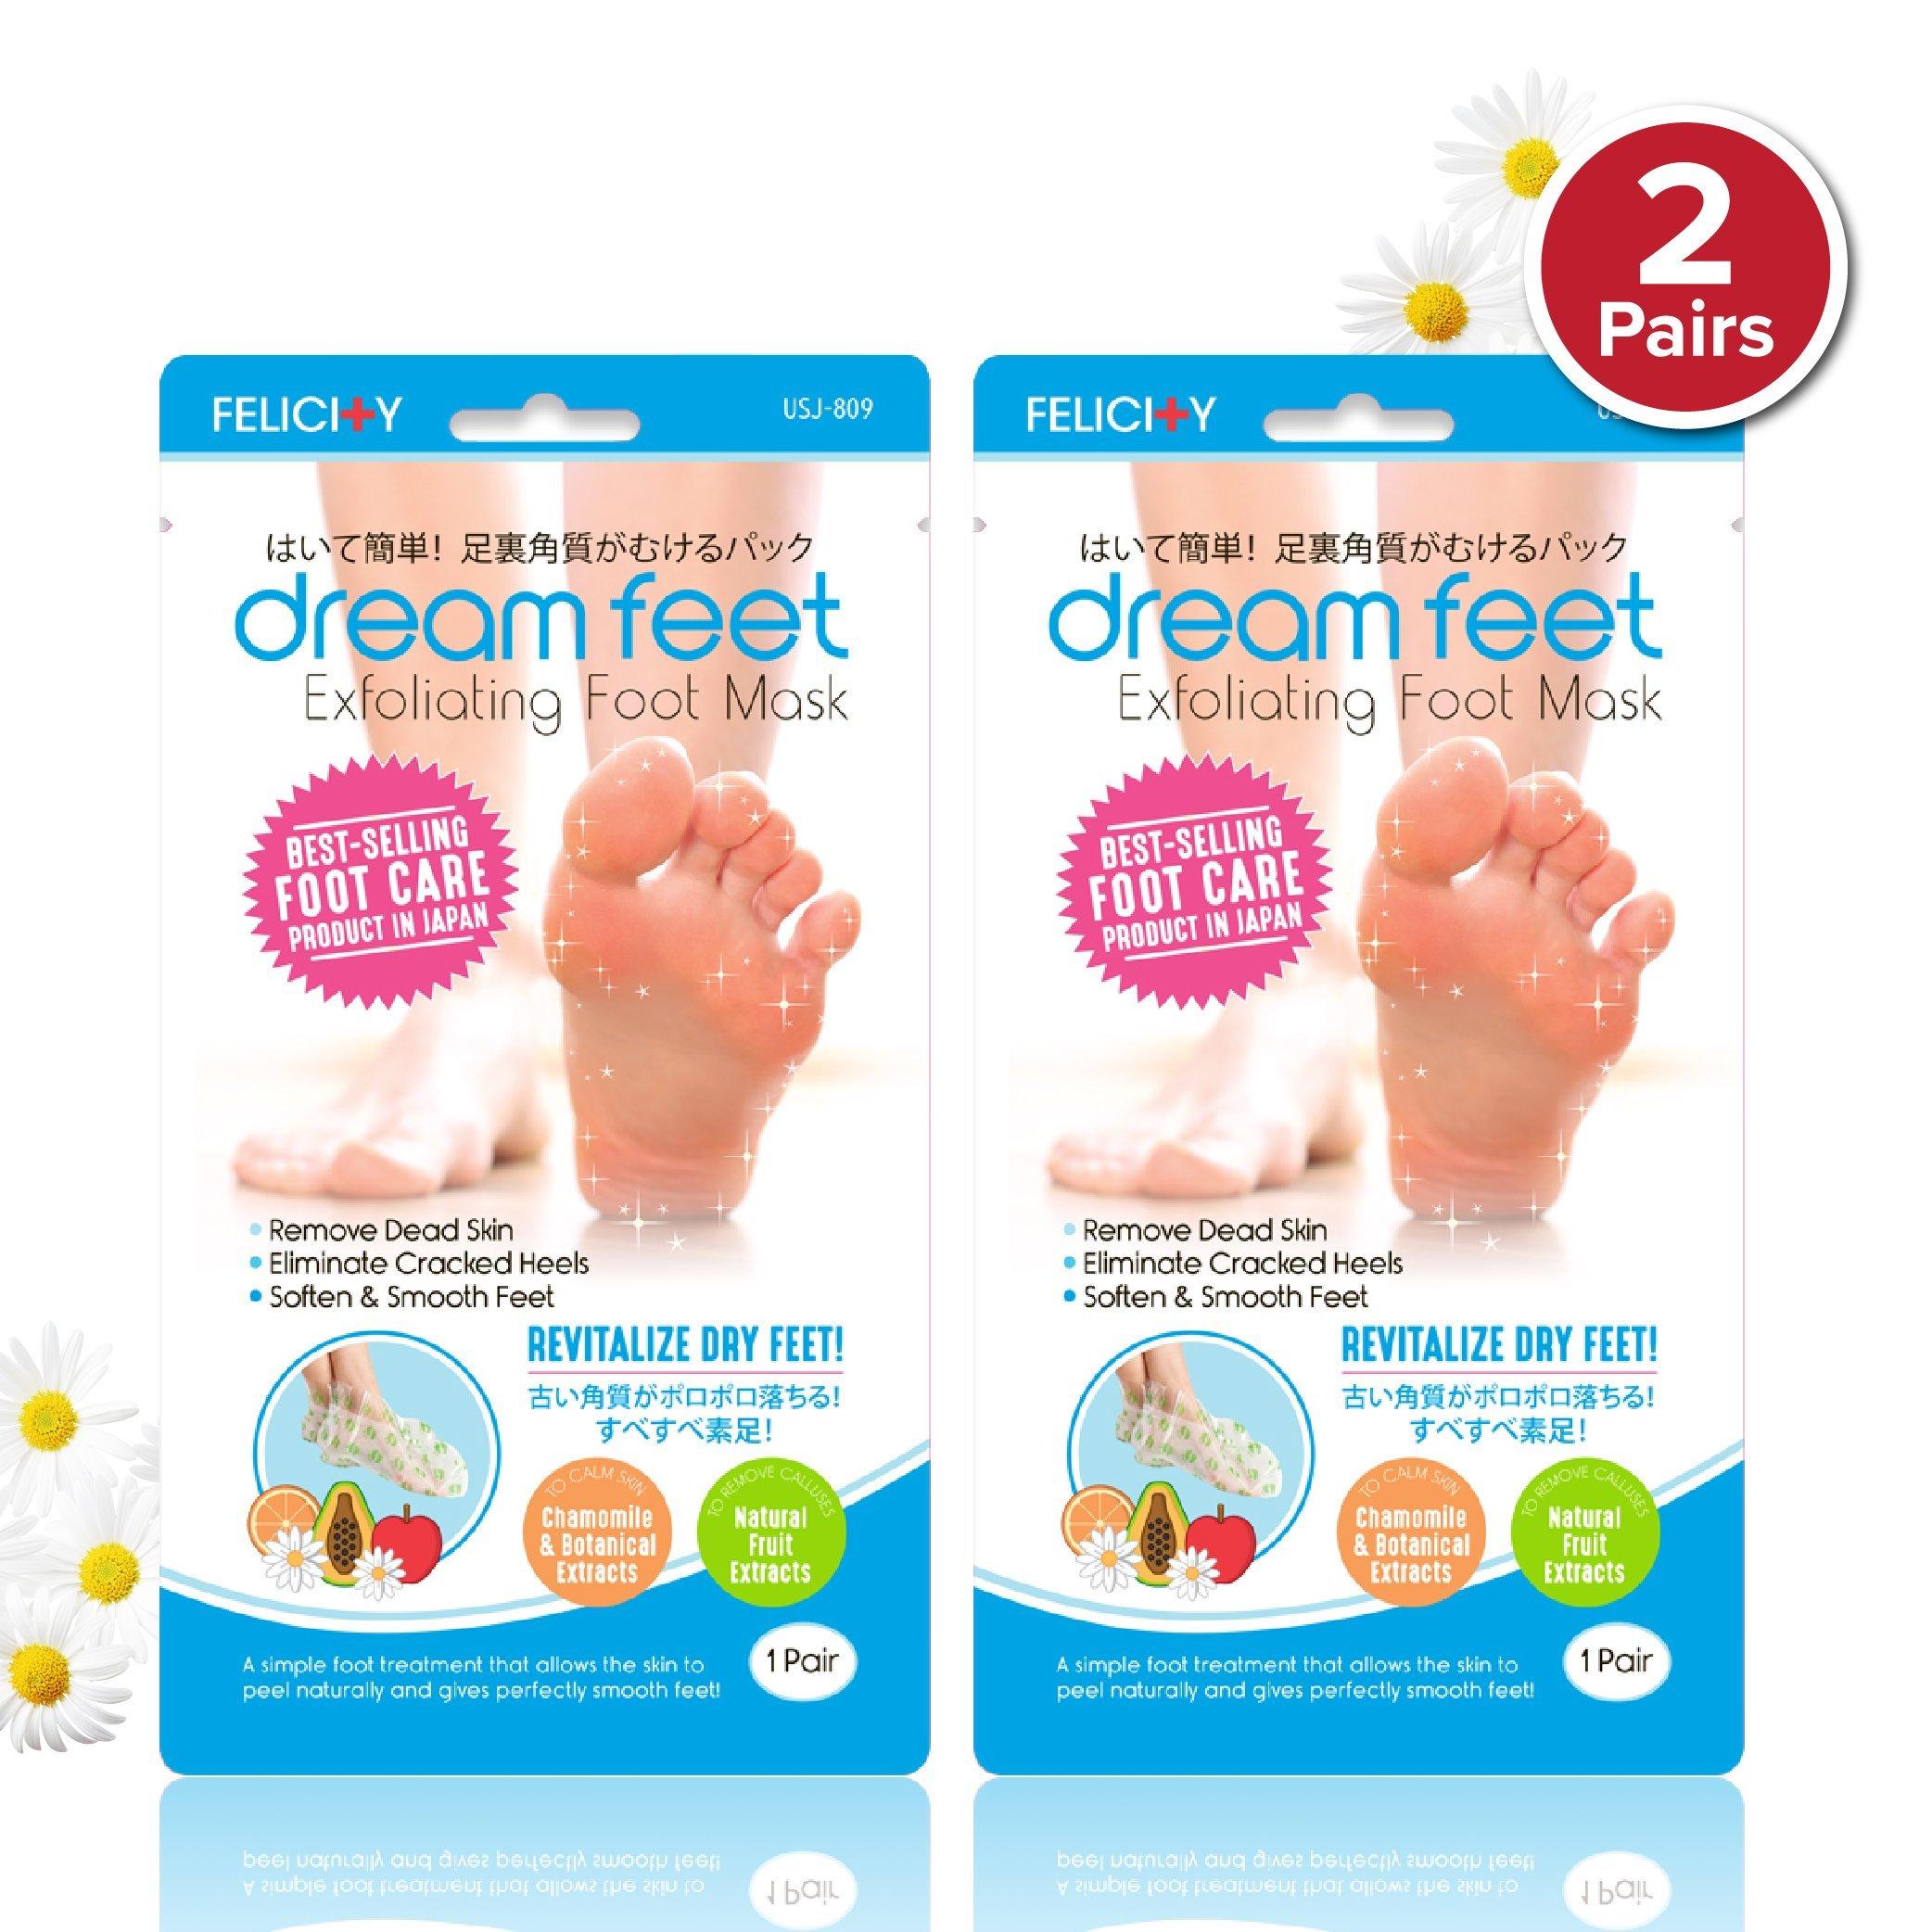 Felicity Dream Feet Exfoliating Foot Peeling Mask (2 Pairs)